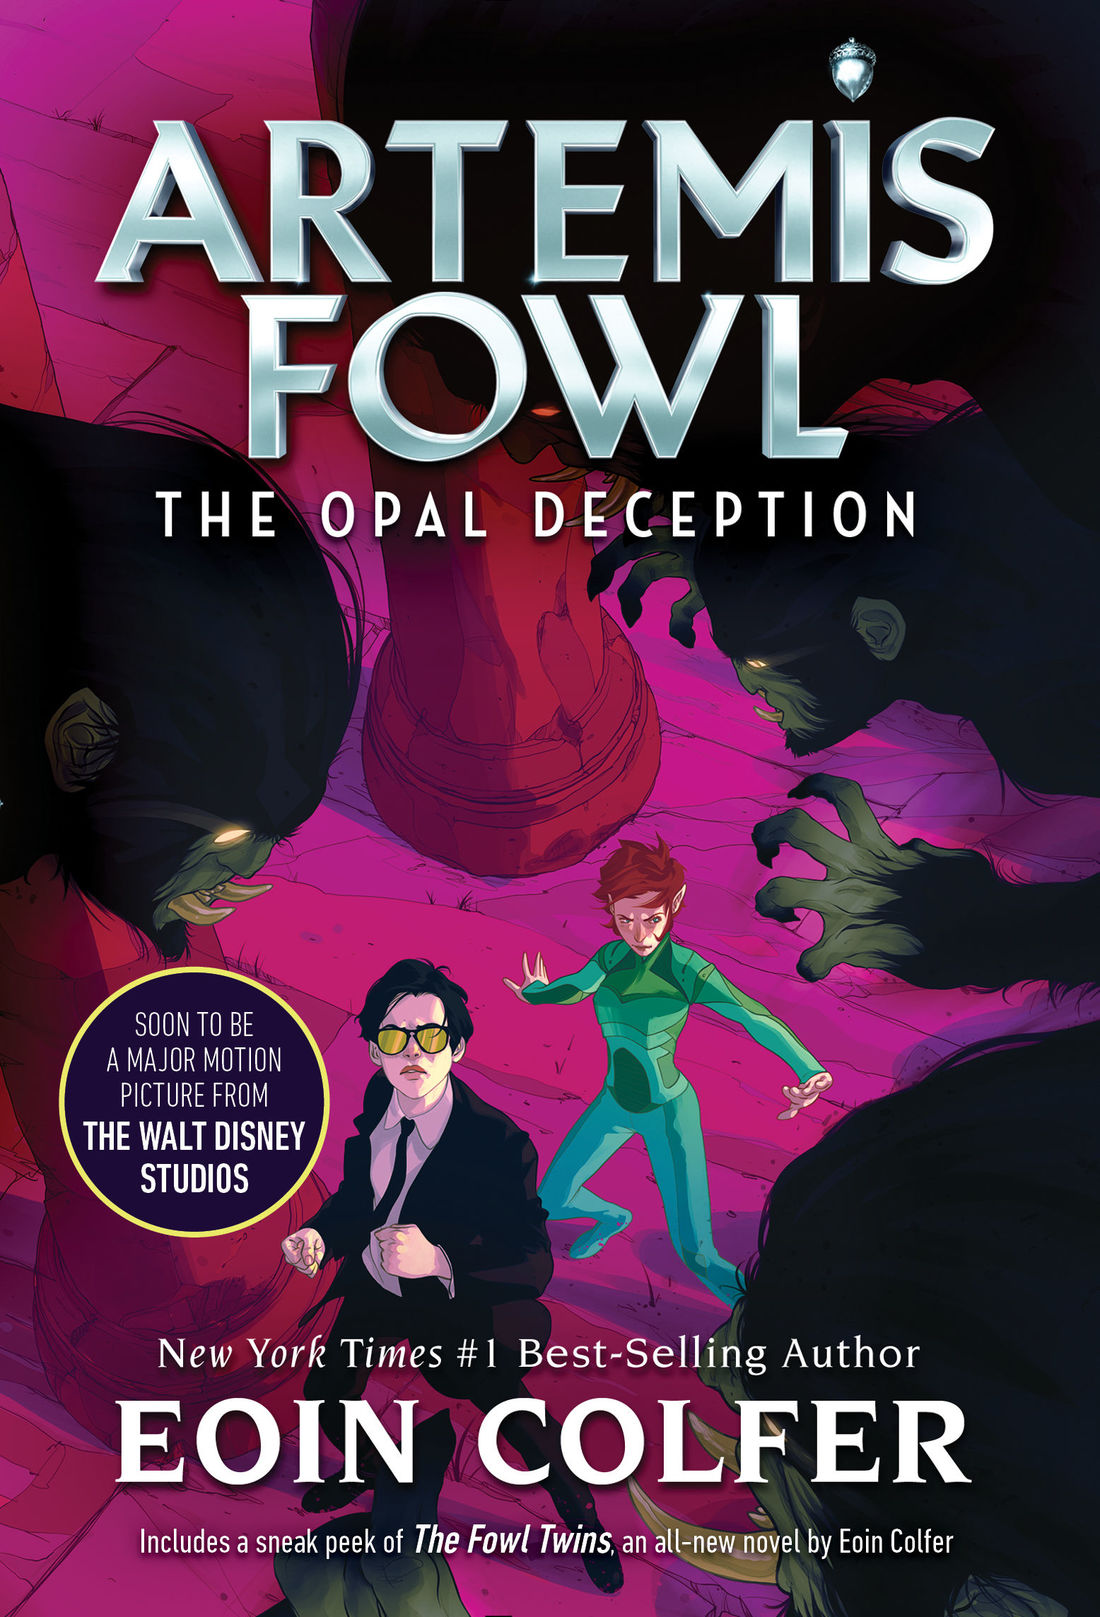 Artemis Fowl And The Opal Deception Novel Artemis Fowl